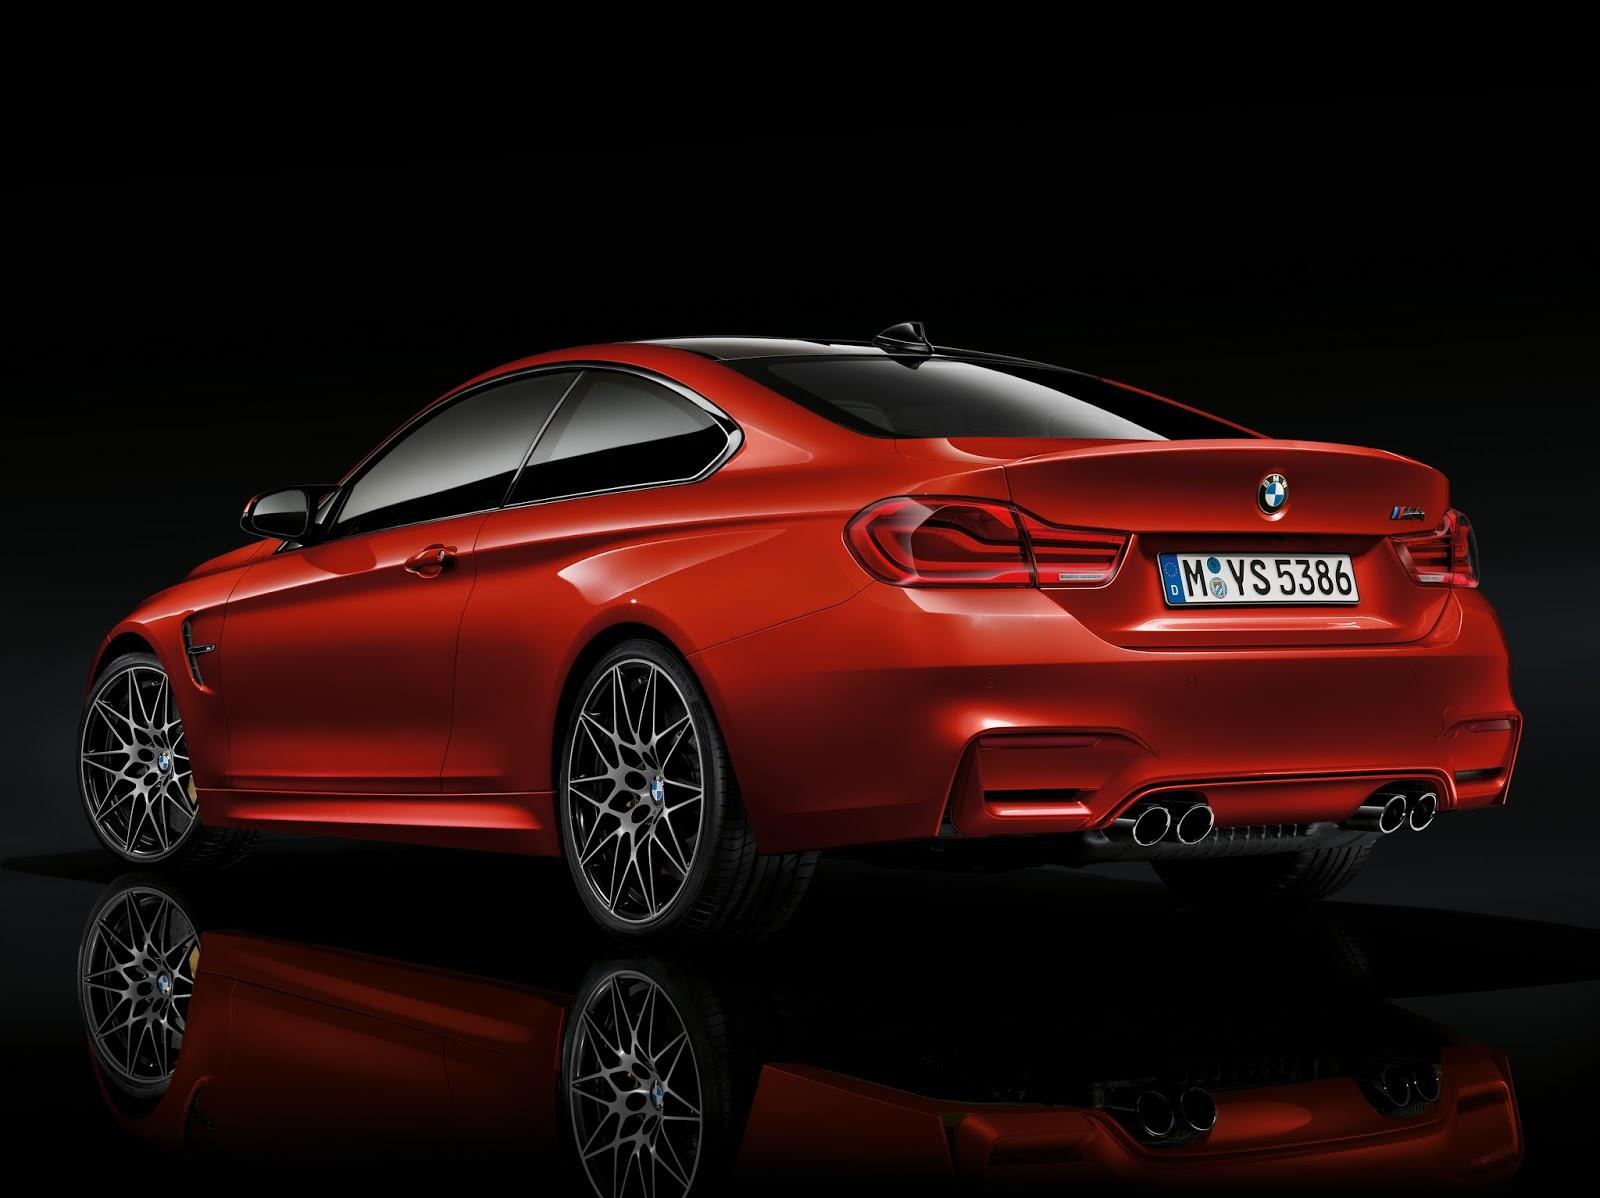 P90244956 highRes bmw m4 coup 01 2017 Η νέα BMW Σειρά 4, με πιο σφιχτή ρύθμιση ανάρτησης BMW, Bmw 4, BMW 4 Cabrio, BMW 4 Coupe, BMW 4 Gran Coupé, Facelift